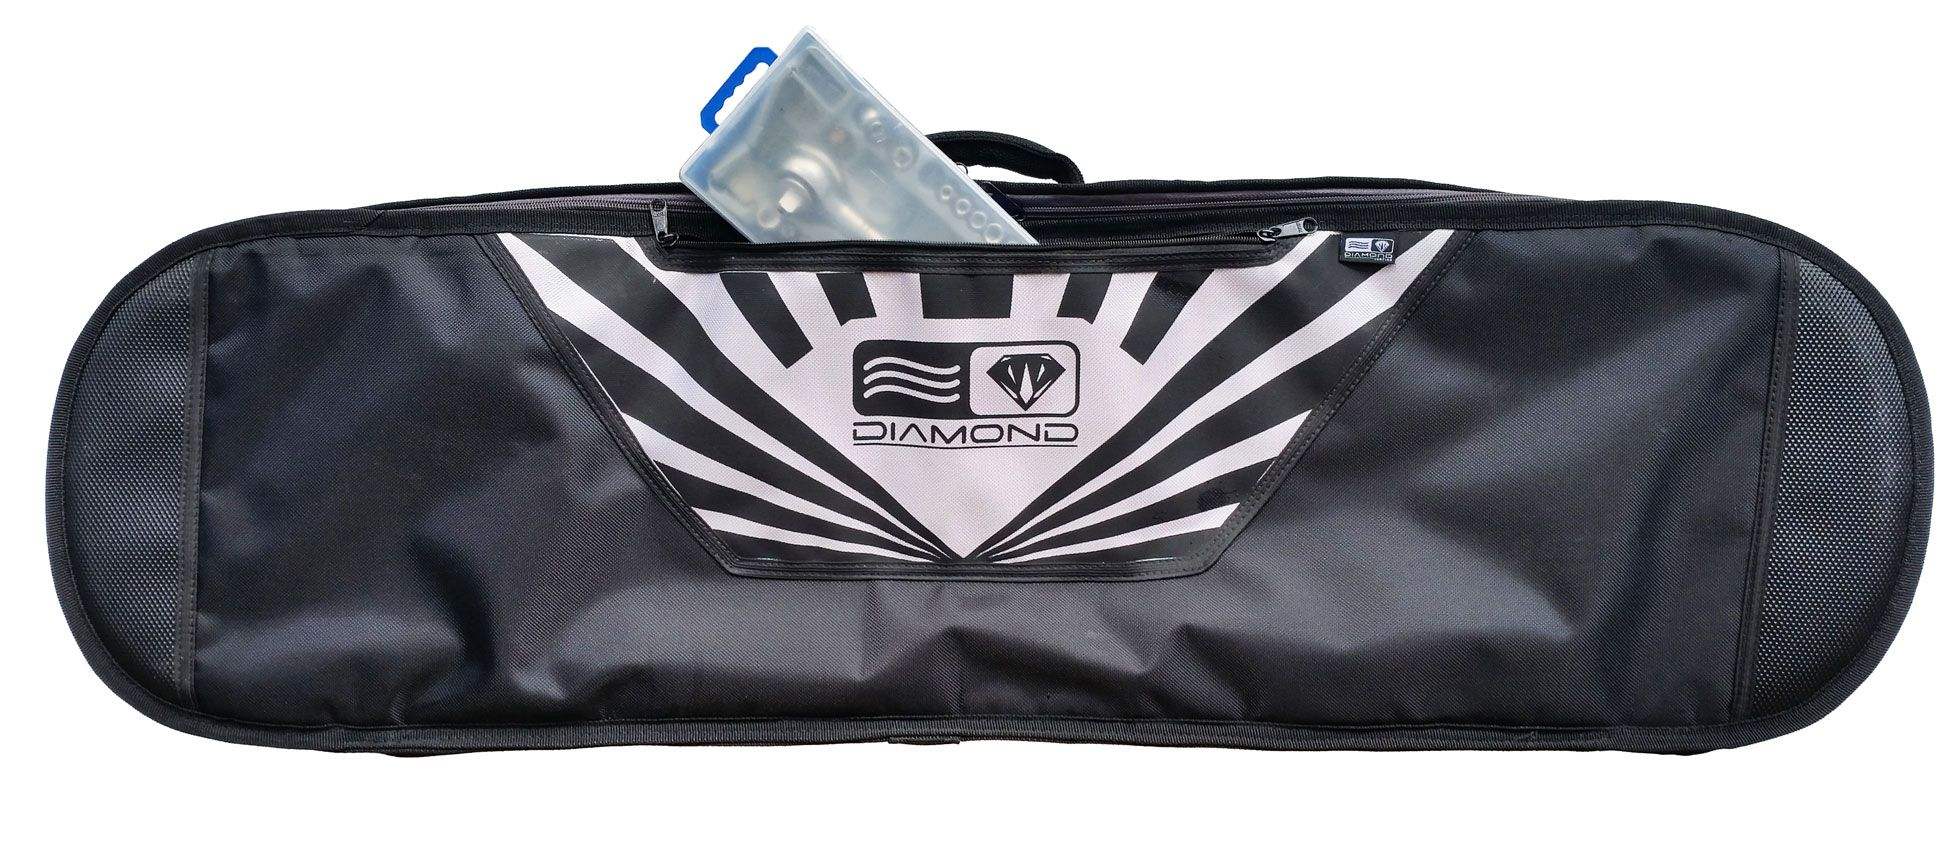 Capa Skate bag Longboard 125cm  x 30cm Diamond Surfing